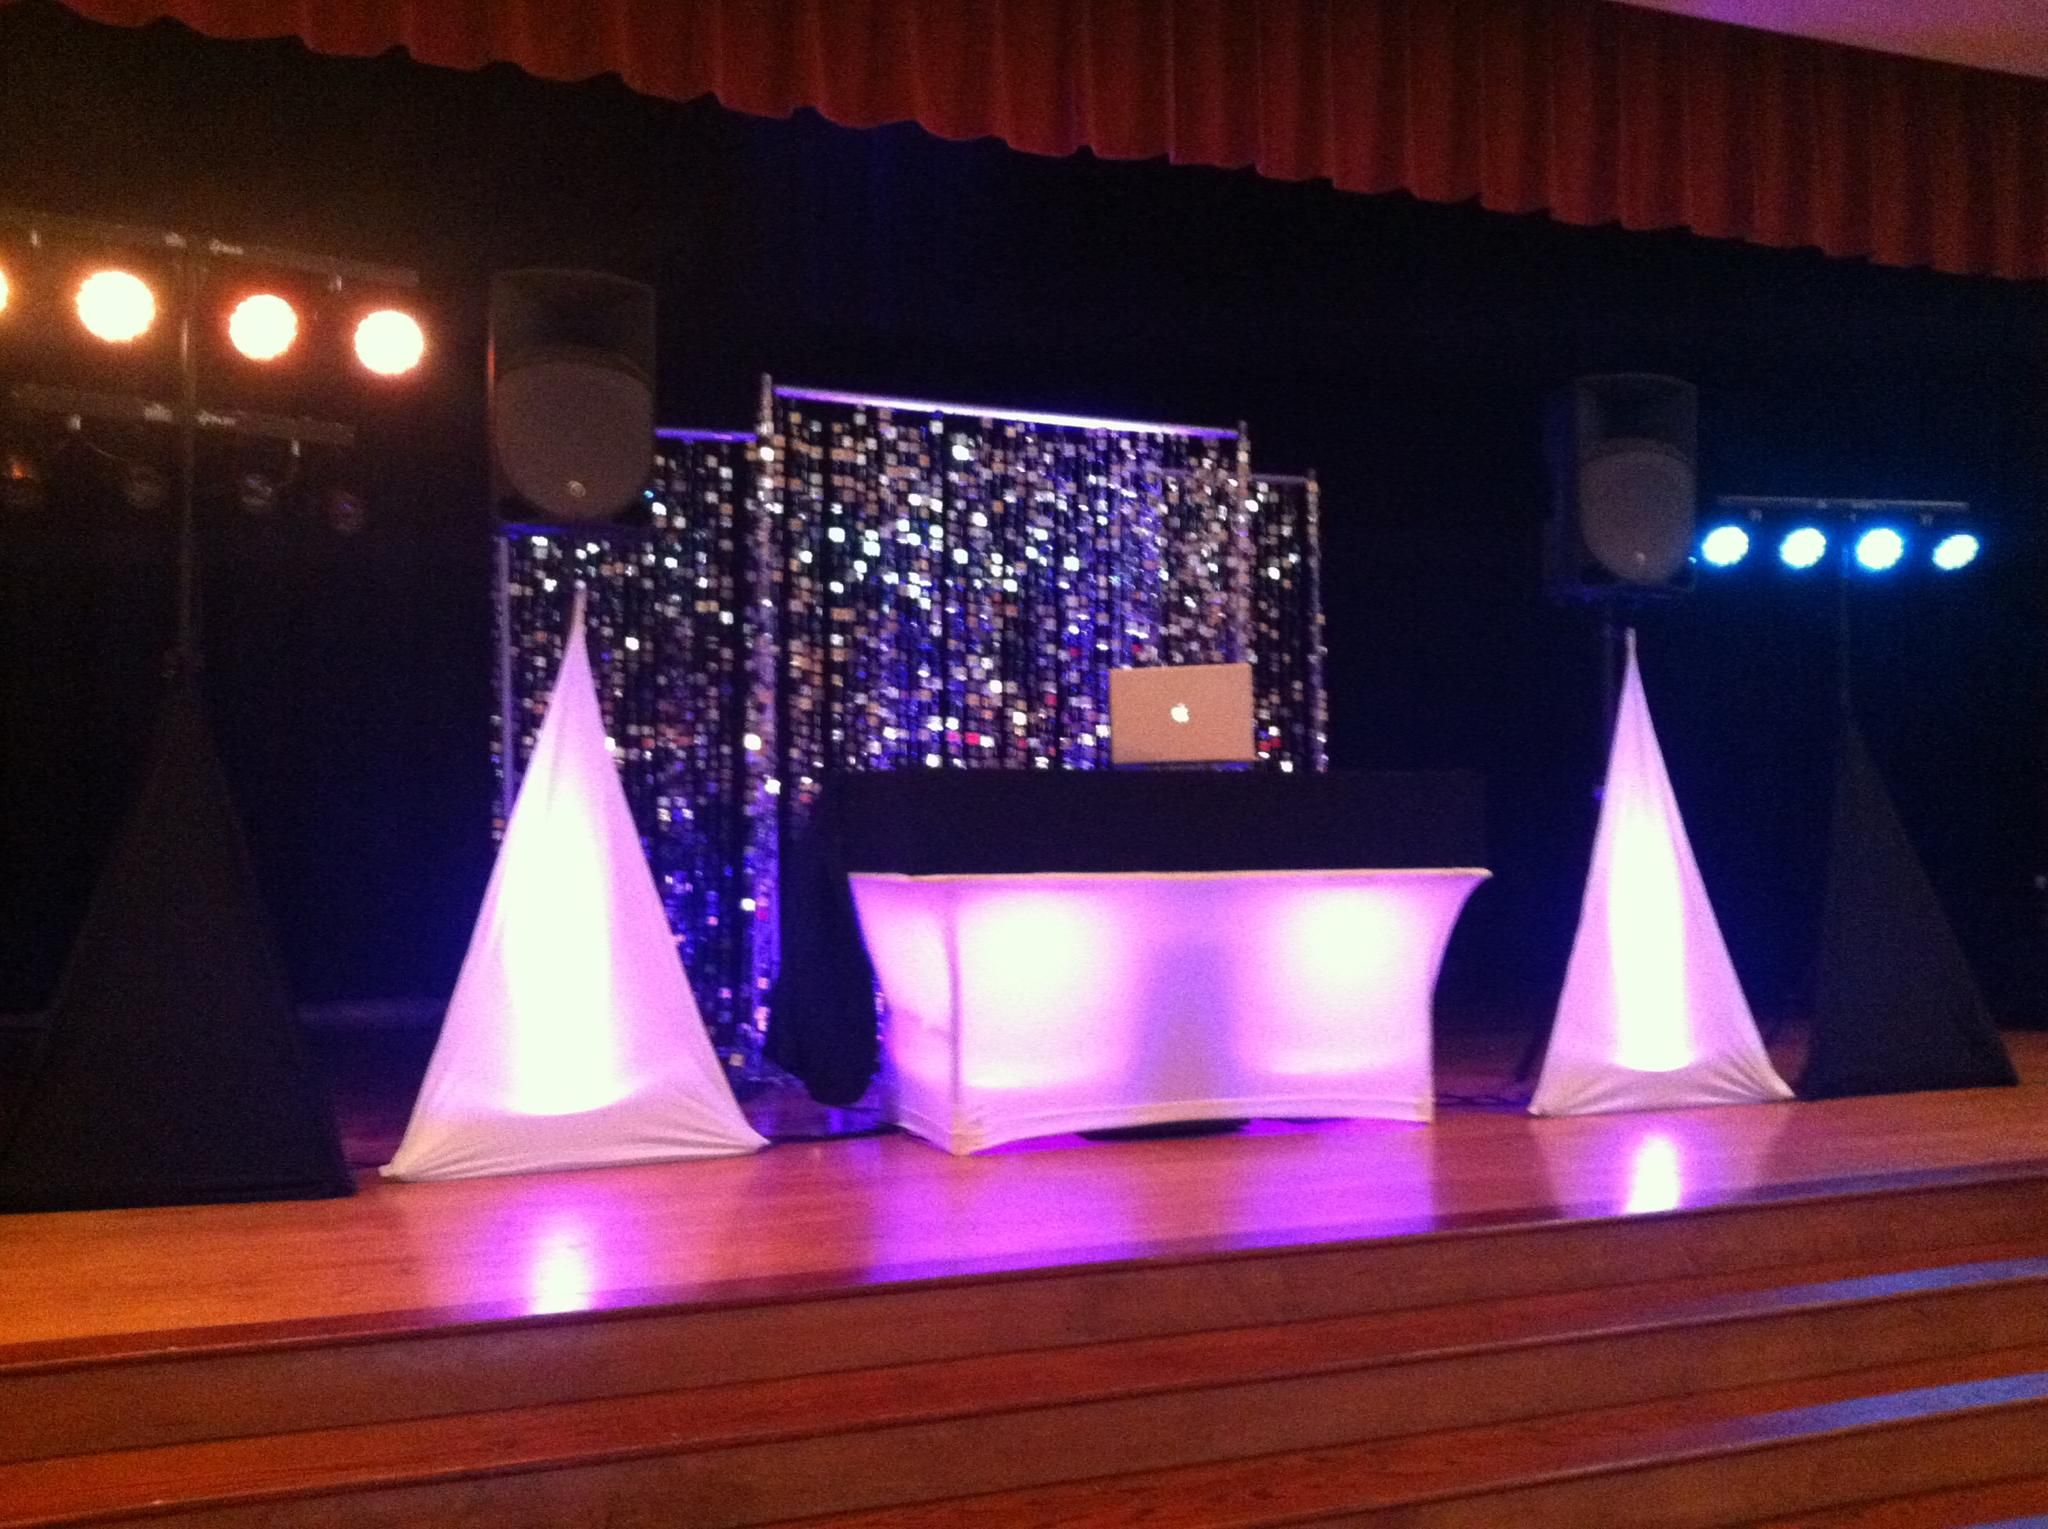 Dj Geoffrey Short Dj Equipment For Sale Wedding Dj Setup Dj Setup